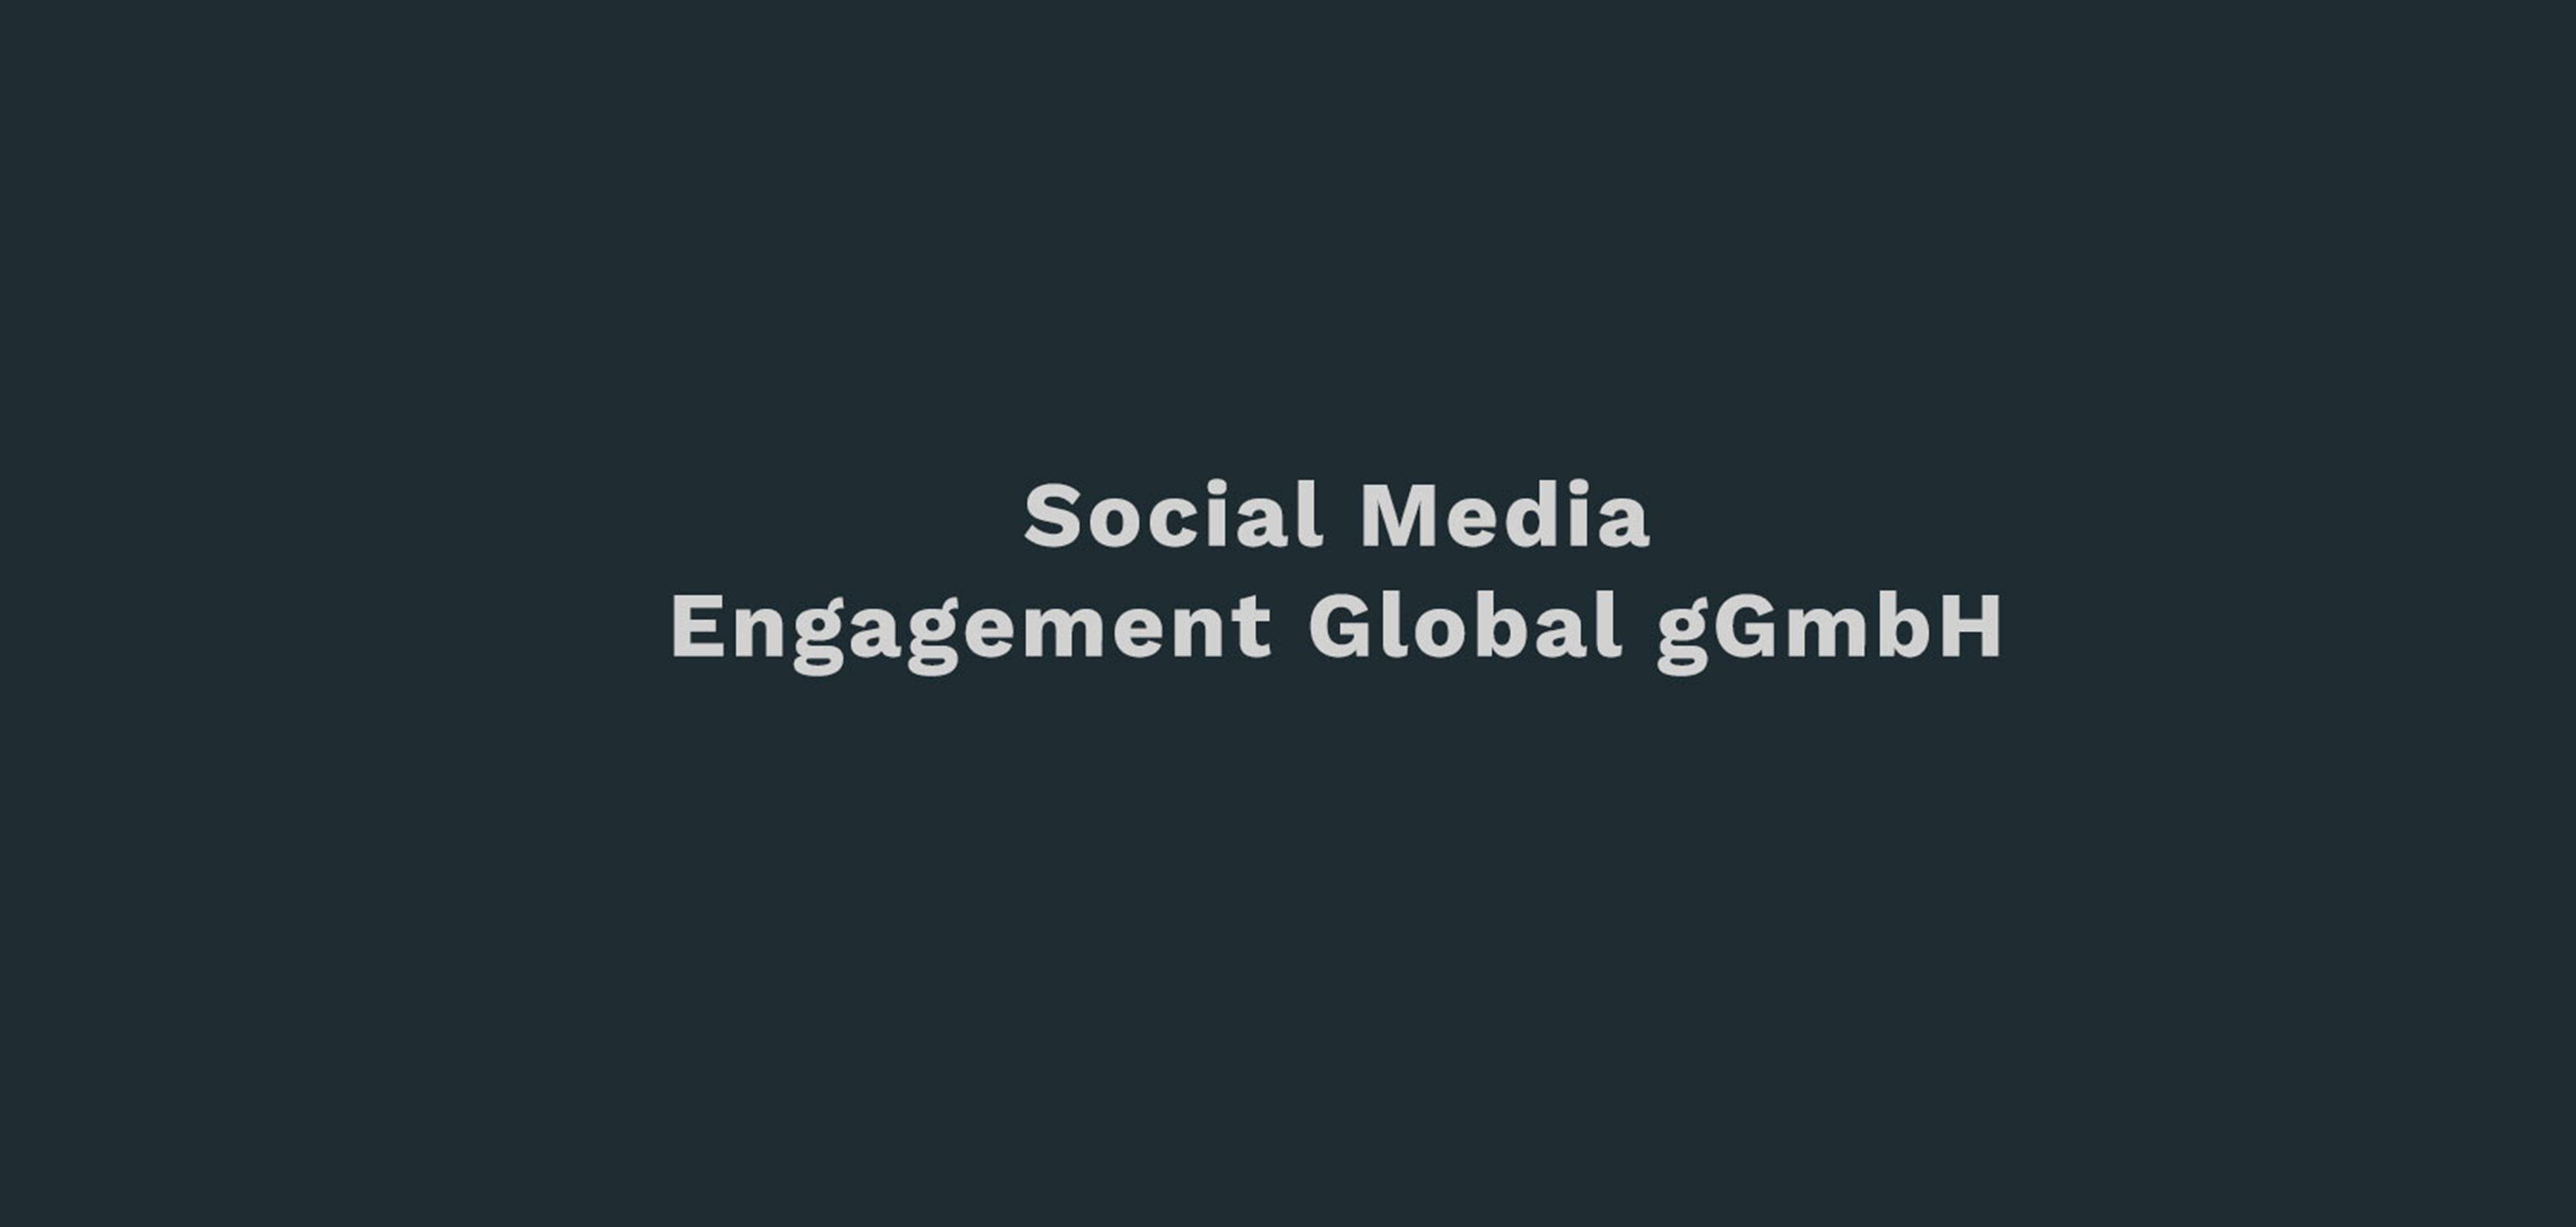 Engagement-Global-gGmbH-DZP-Social-Media